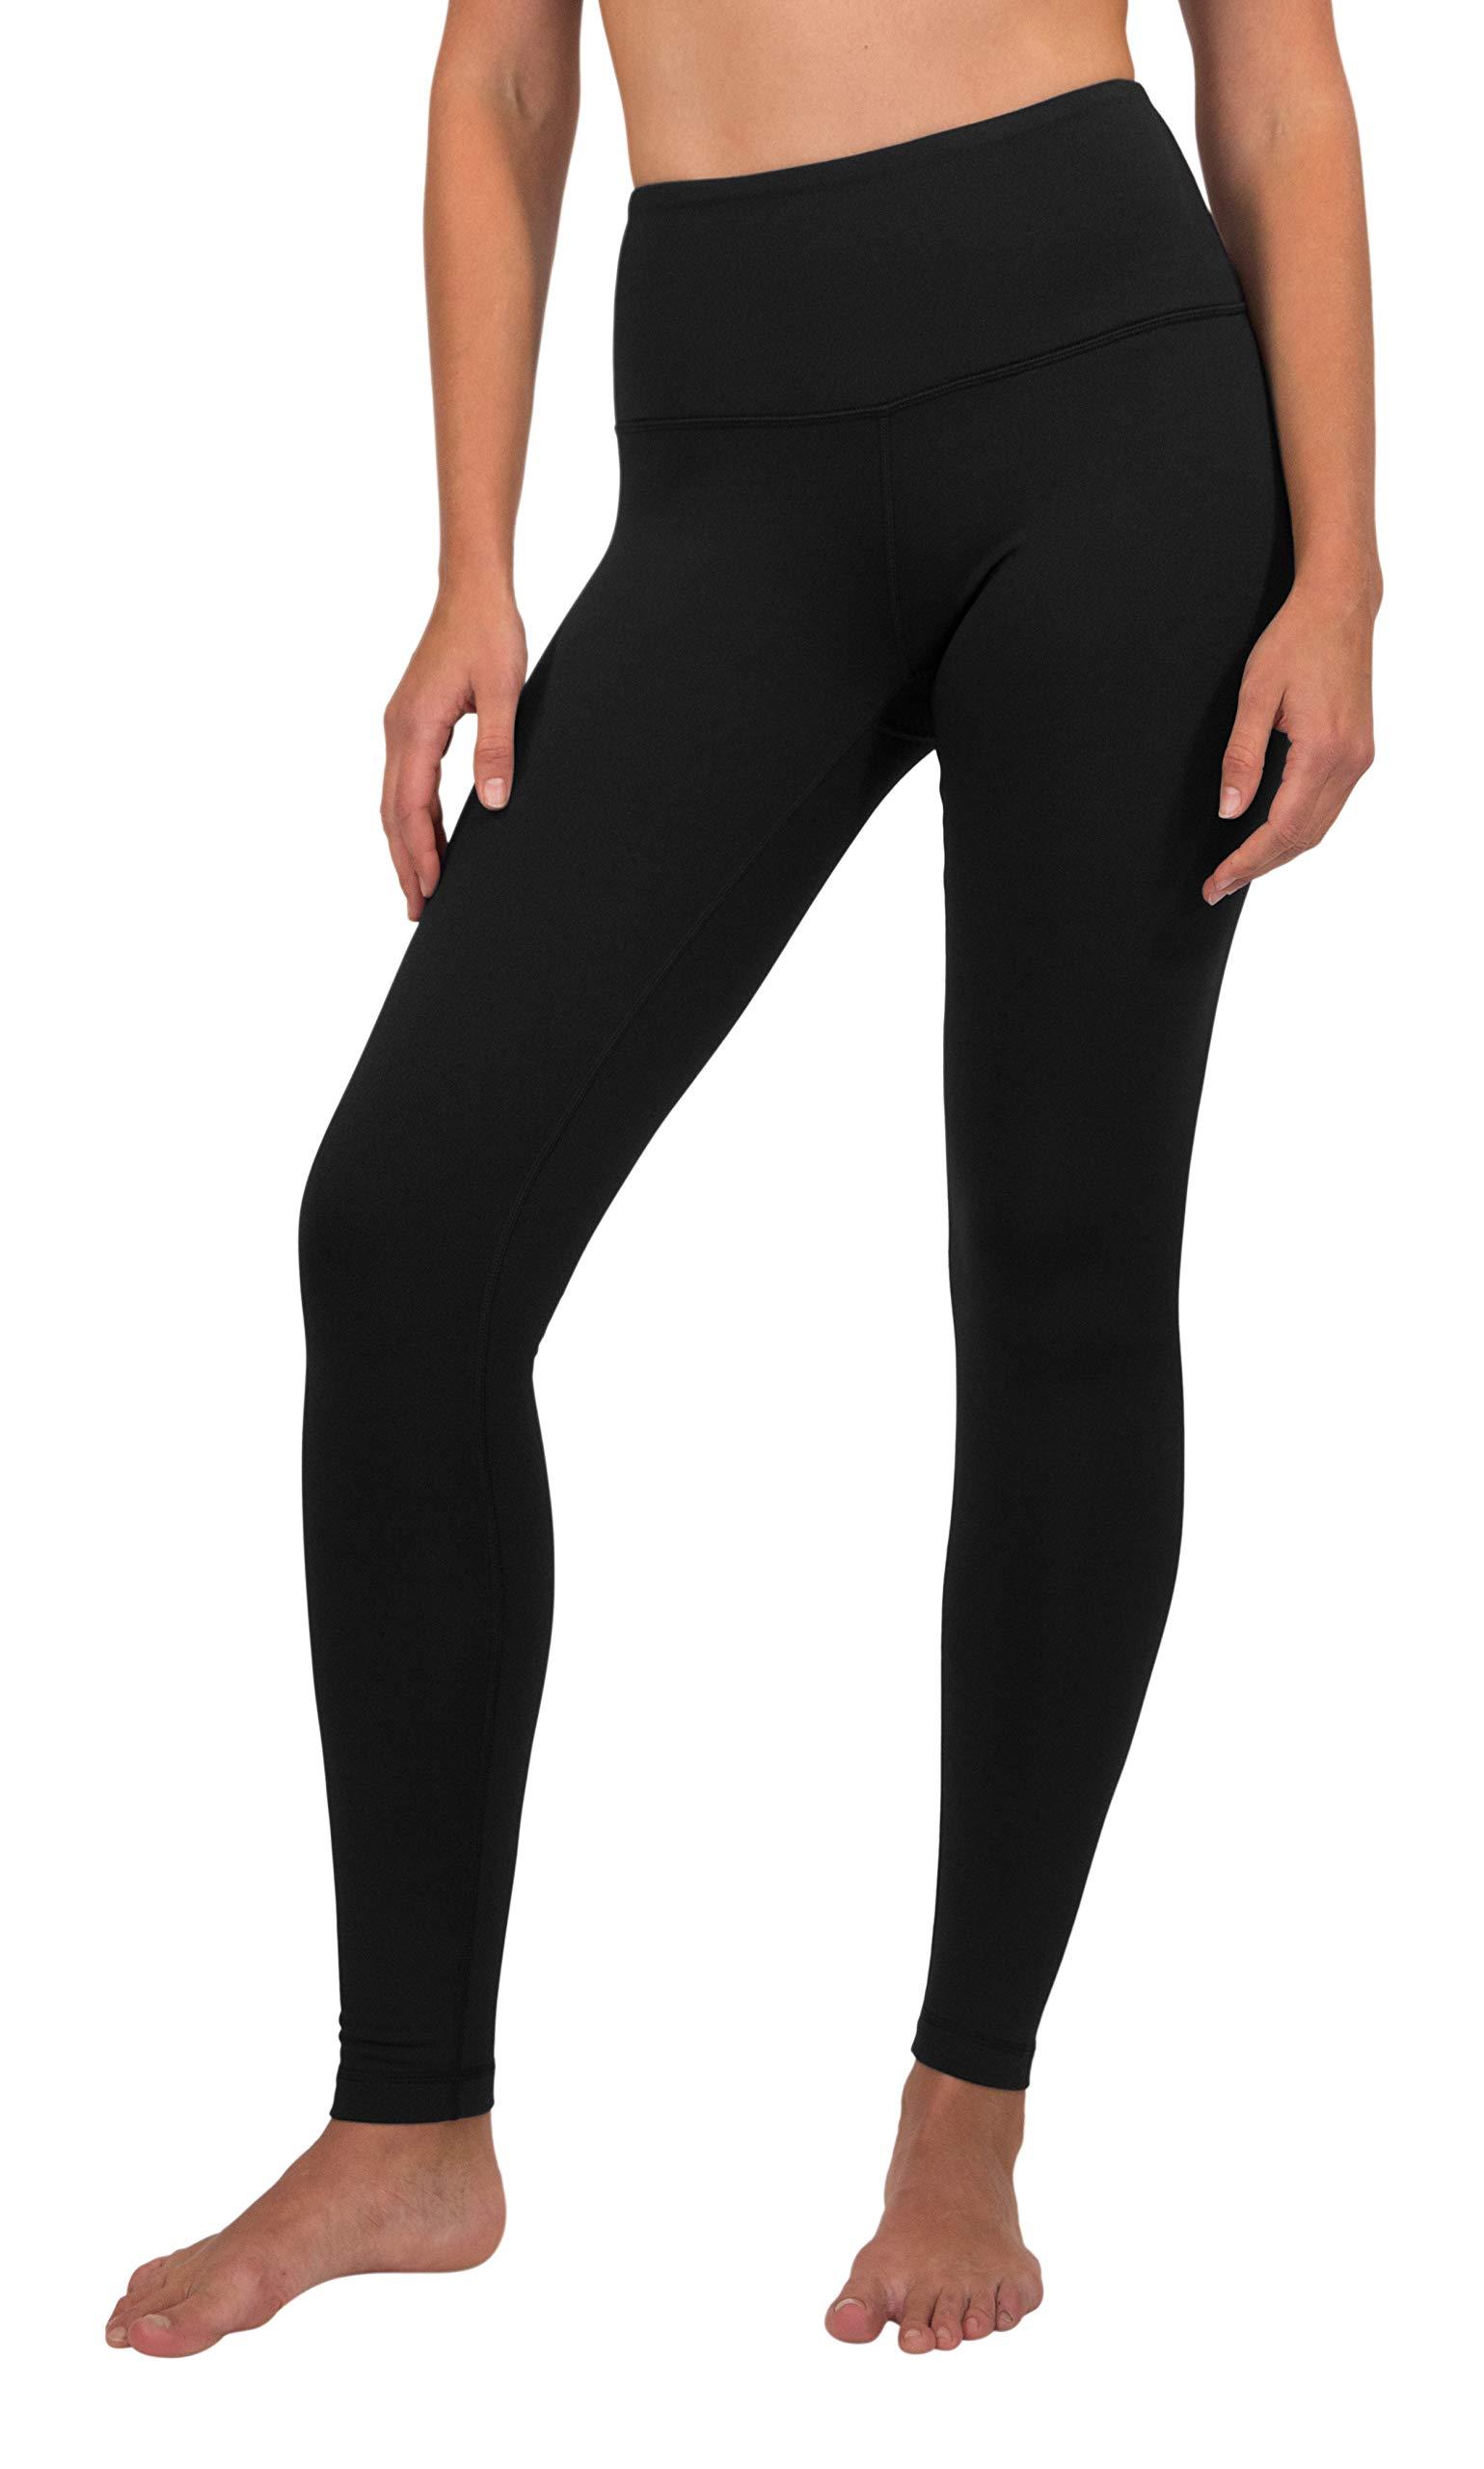 90 Degree By Reflex High Waist Fleece Lined Leggings - Yoga Pants - Black - Large